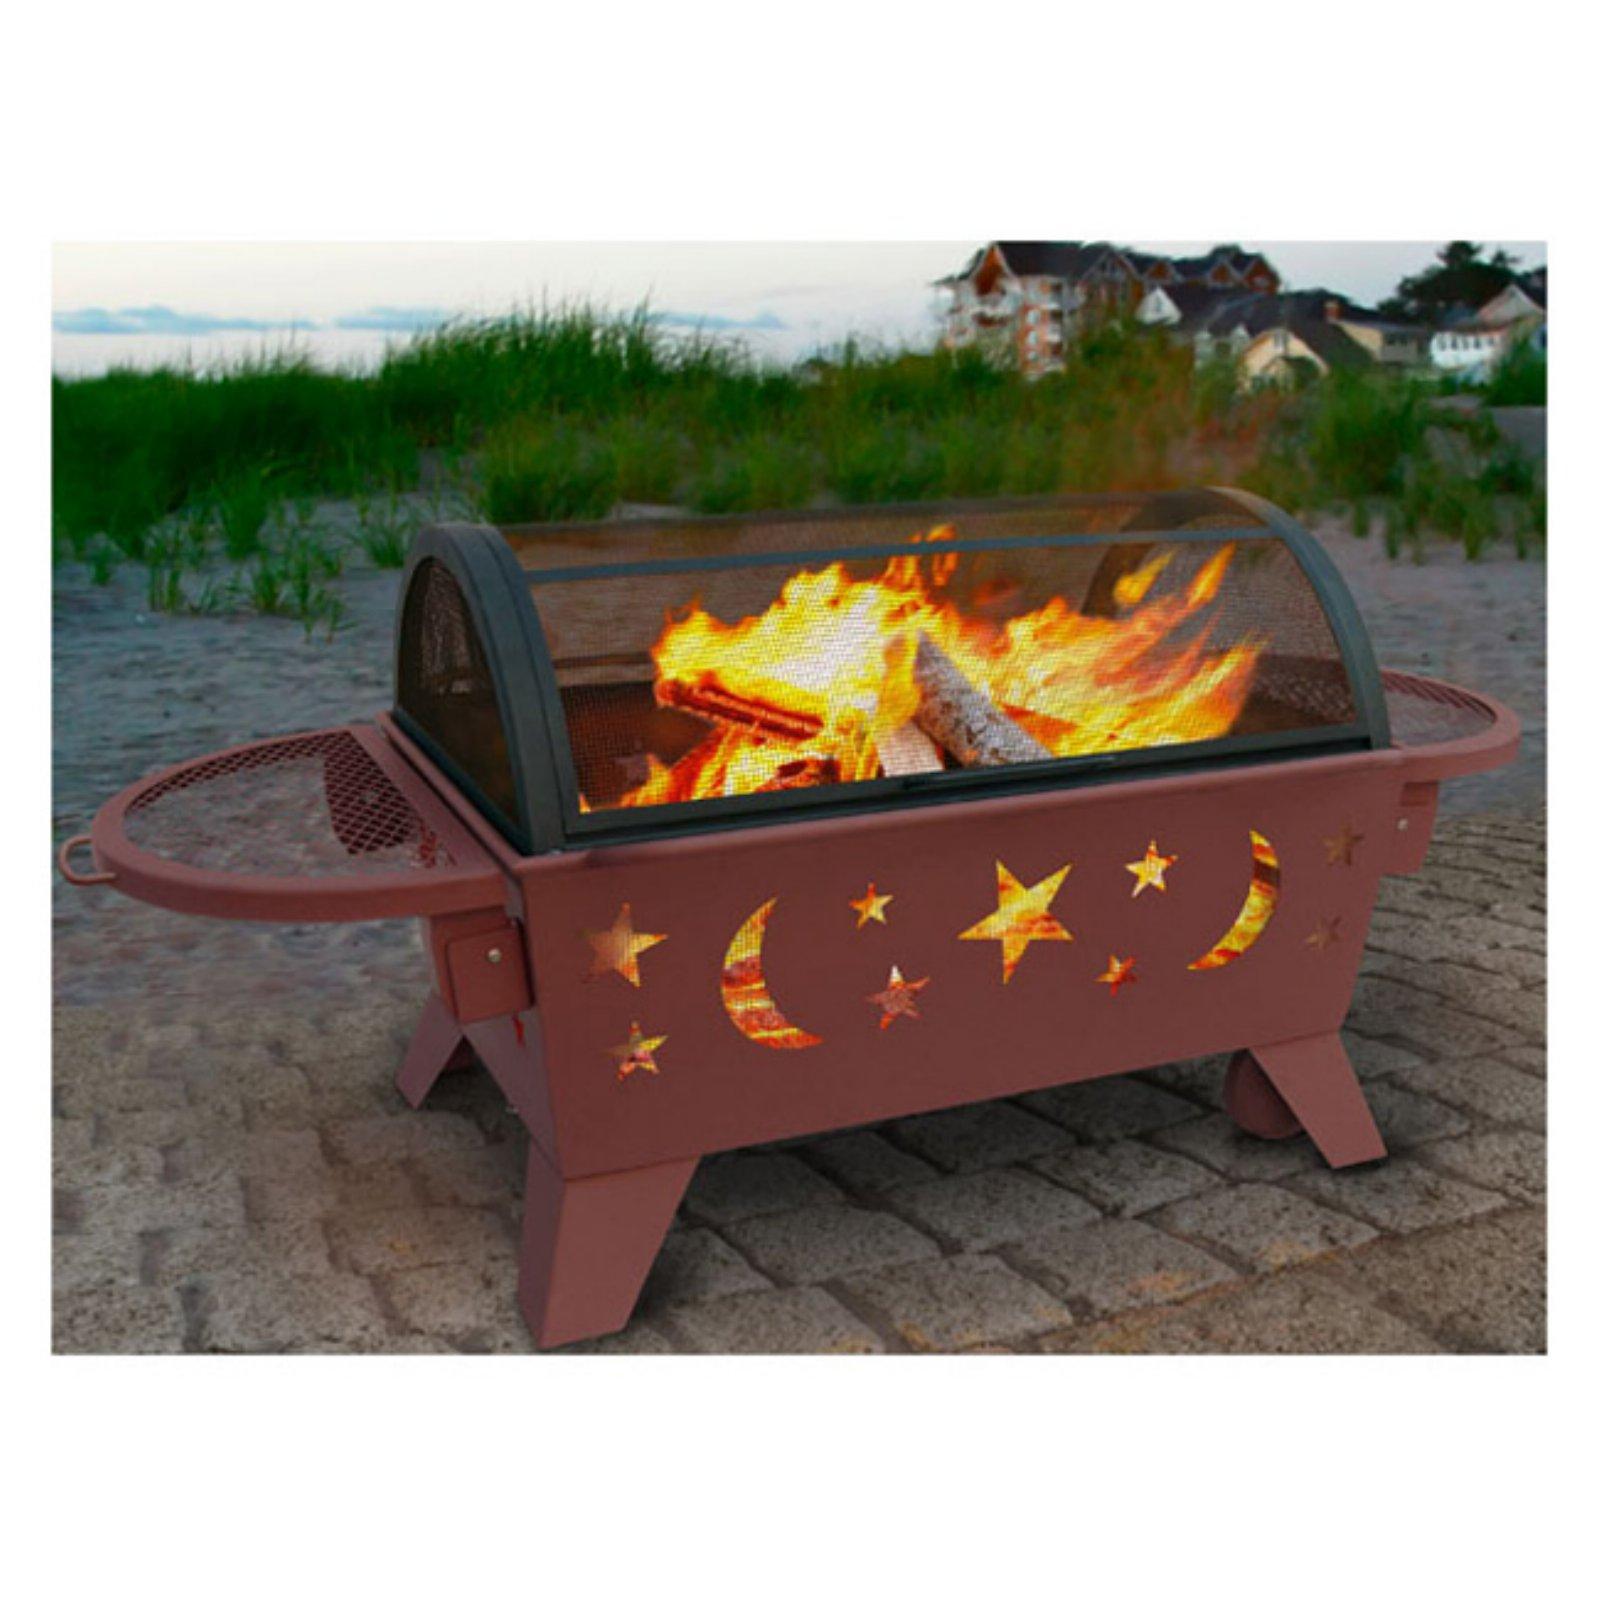 Landmann Northern Lights Outdoor Fireplace Stars and Moon